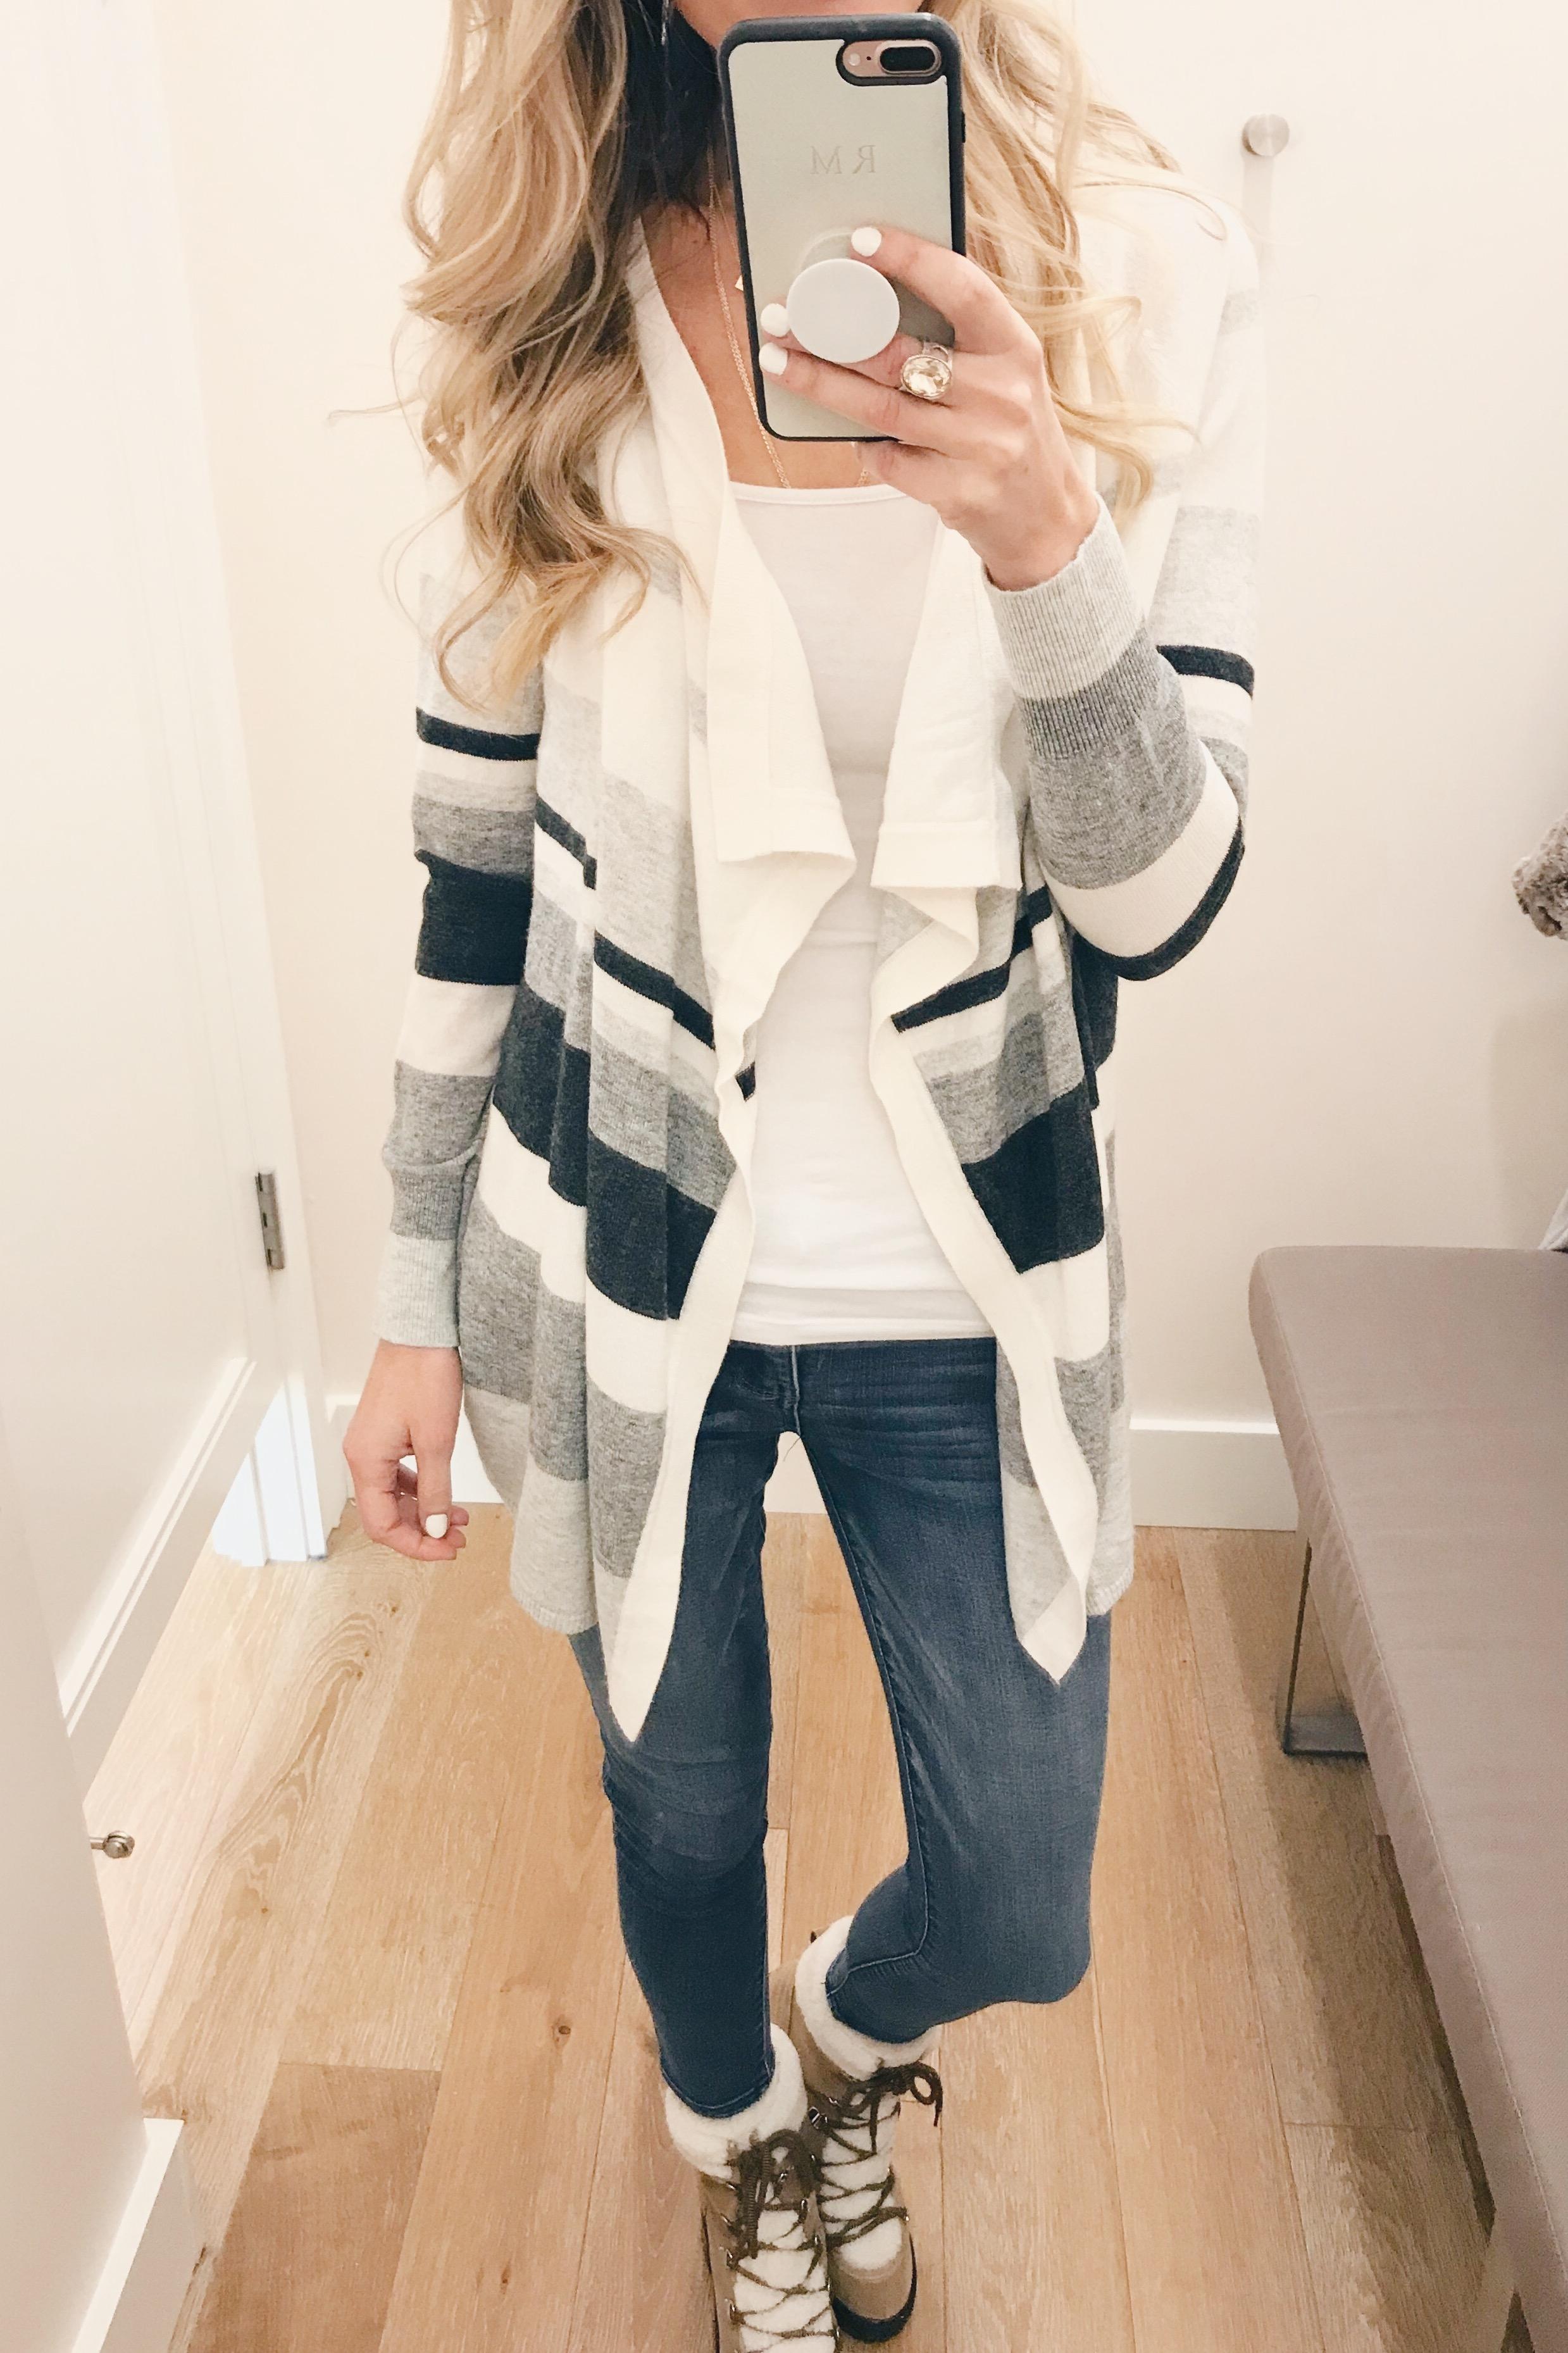 veteran's day weekend sale round up 2018 striped drape cardigan